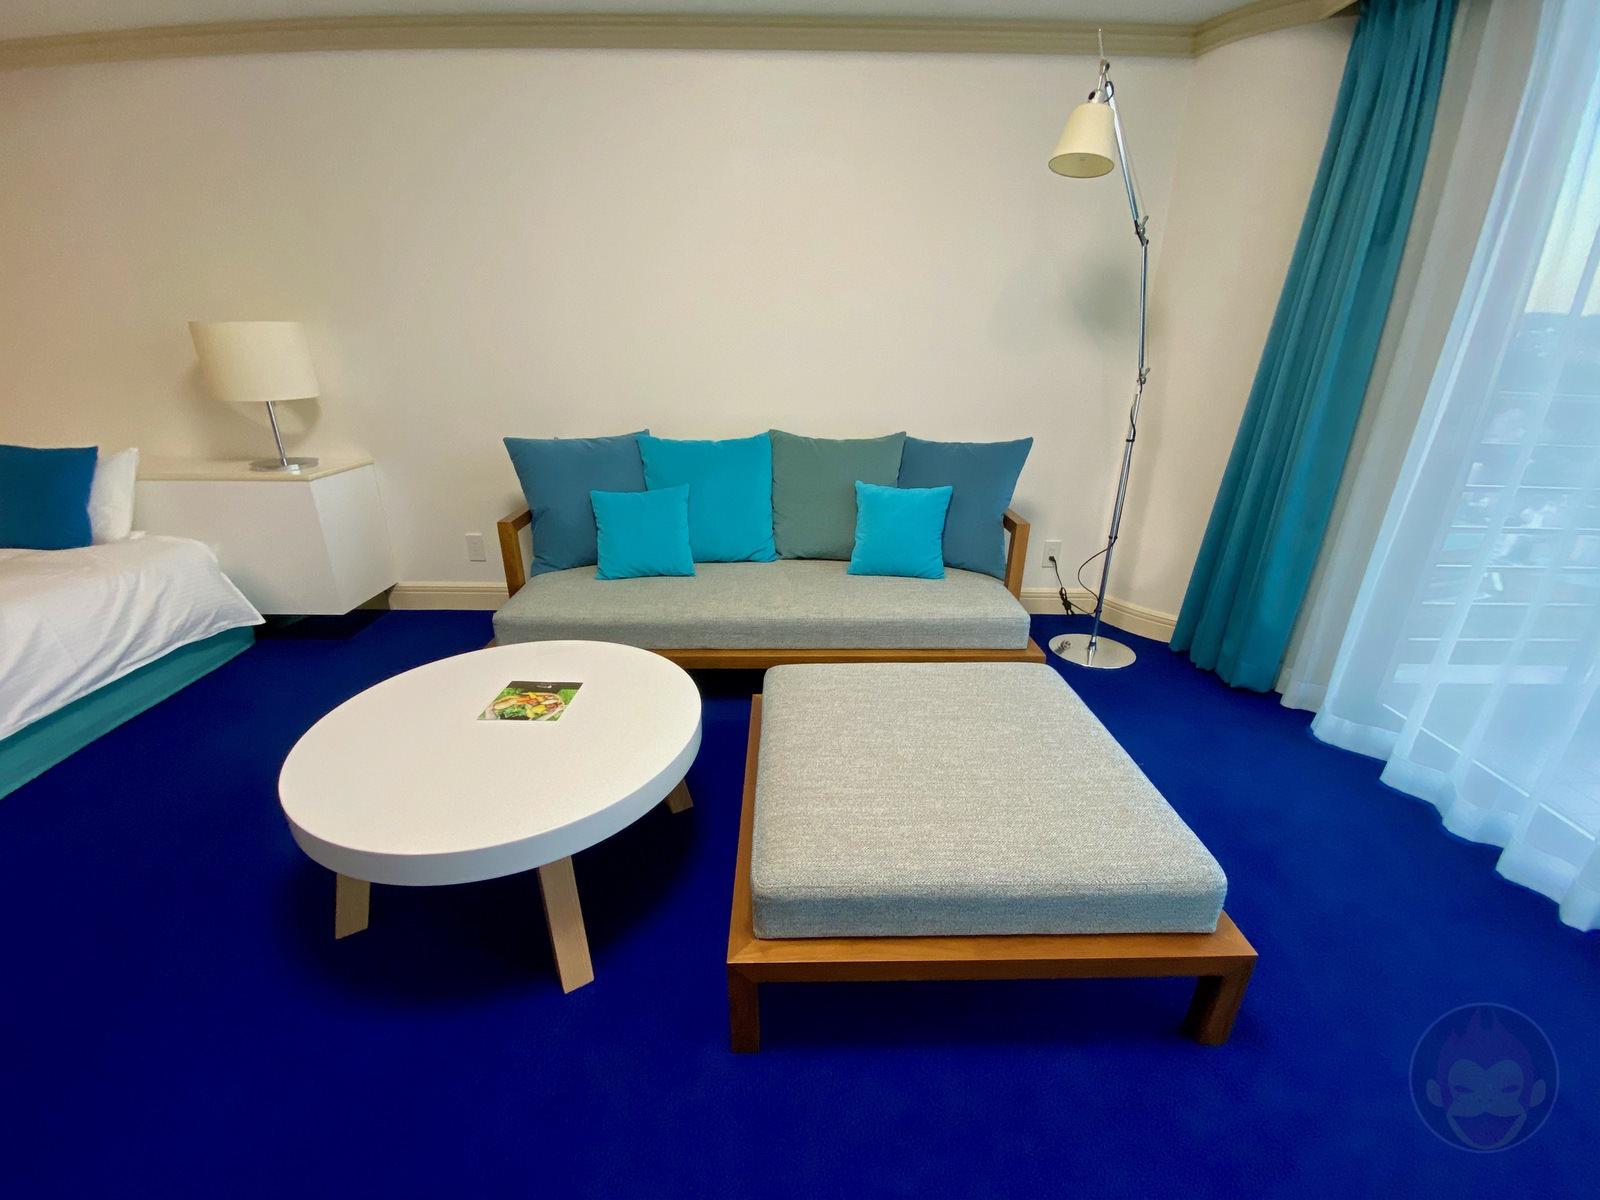 Hoshino Resonale Atami Room 07